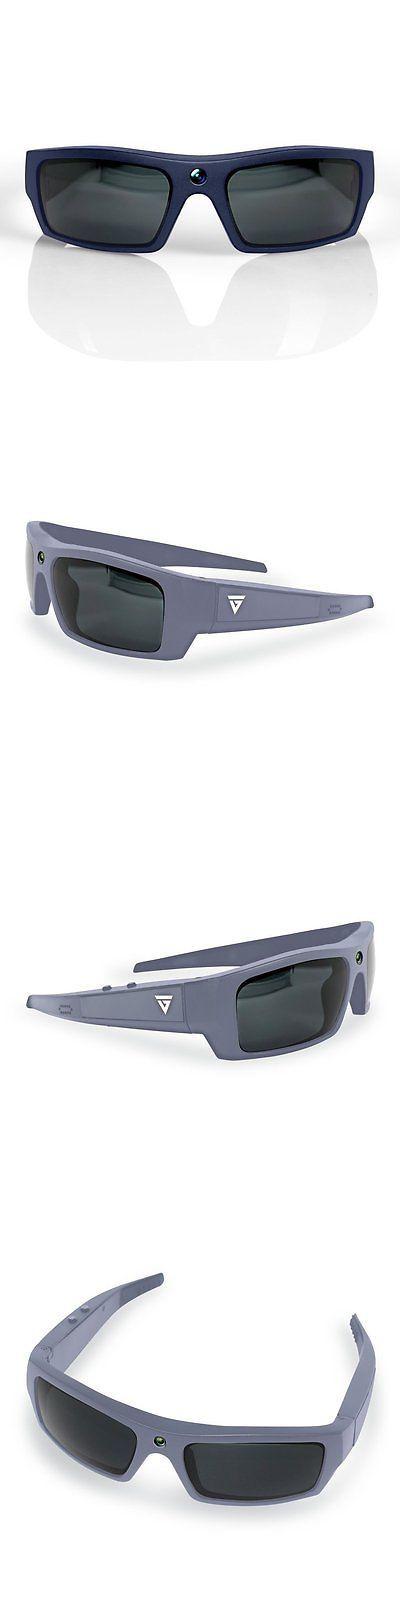 Video Glasses: Govision Gv-Sol1440-Tt Sol 1080P Hd Video Recording Bluetooth Glasses - Titanium -> BUY IT NOW ONLY: $240.92 on eBay!